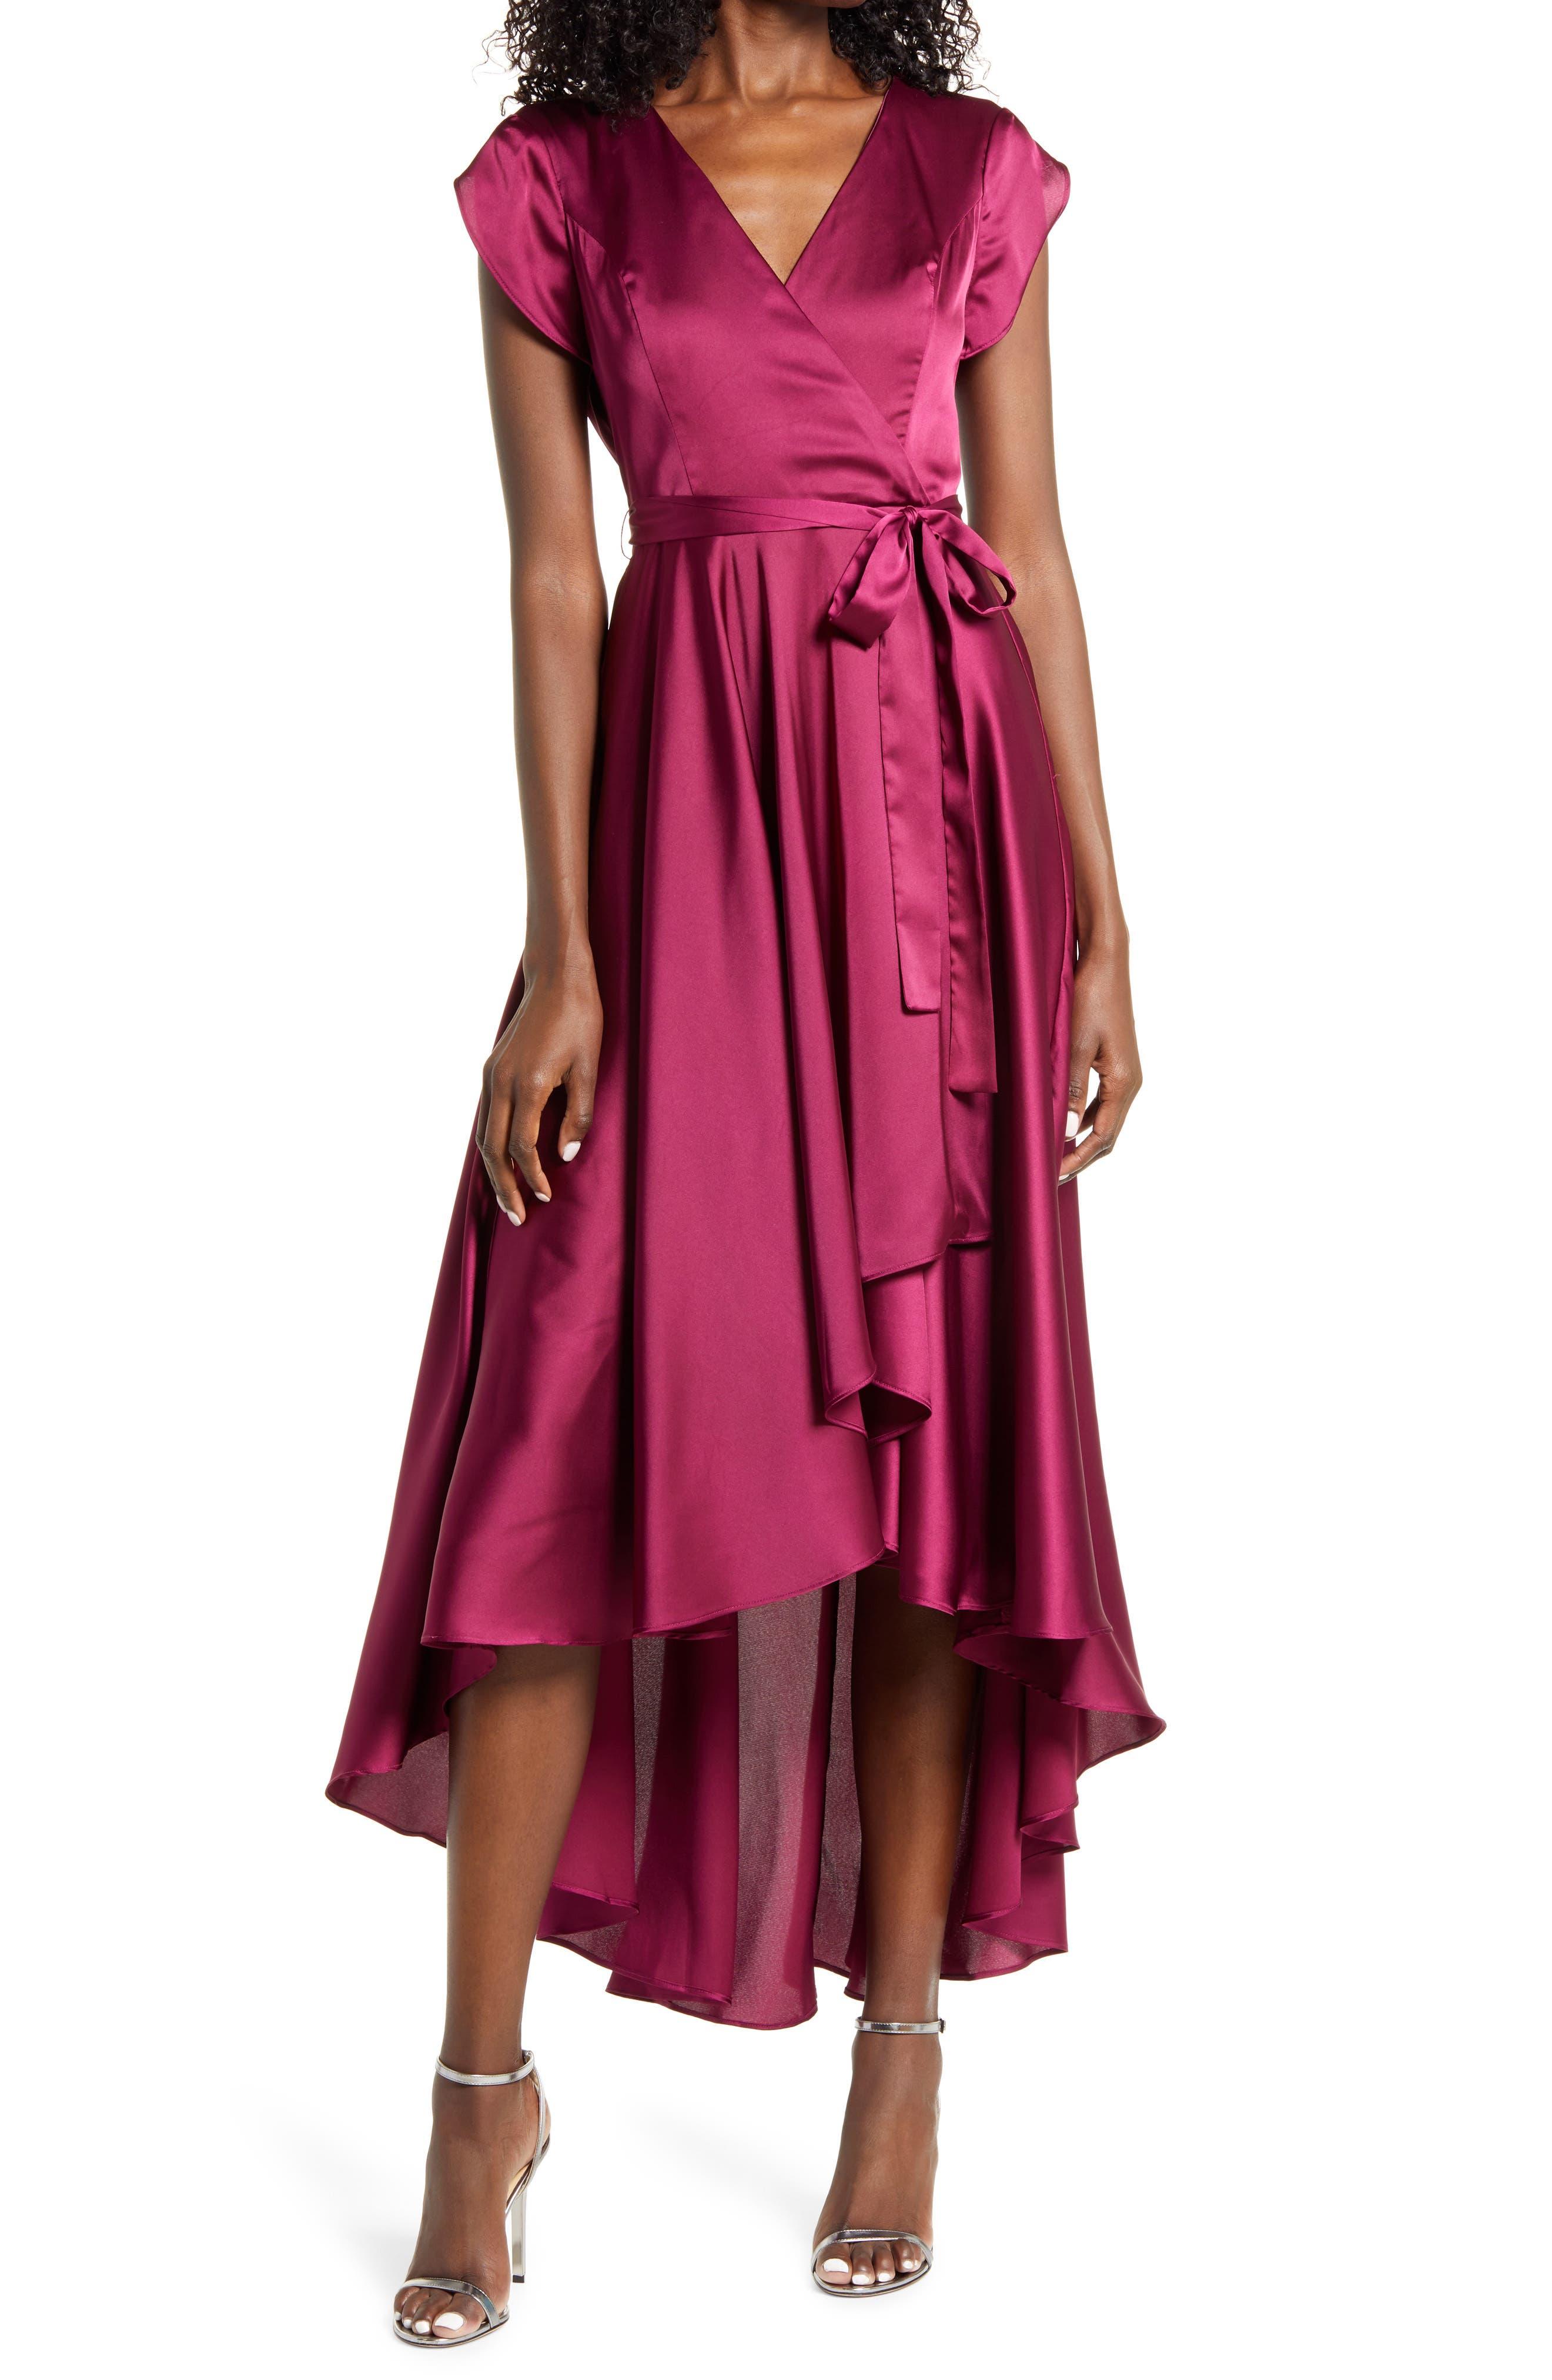 70s Dresses – Disco Dress, Hippie Dress, Wrap Dress Womens Lulus Fallen For You Satin Highlow Dress Size X-Large - Purple $36.00 AT vintagedancer.com